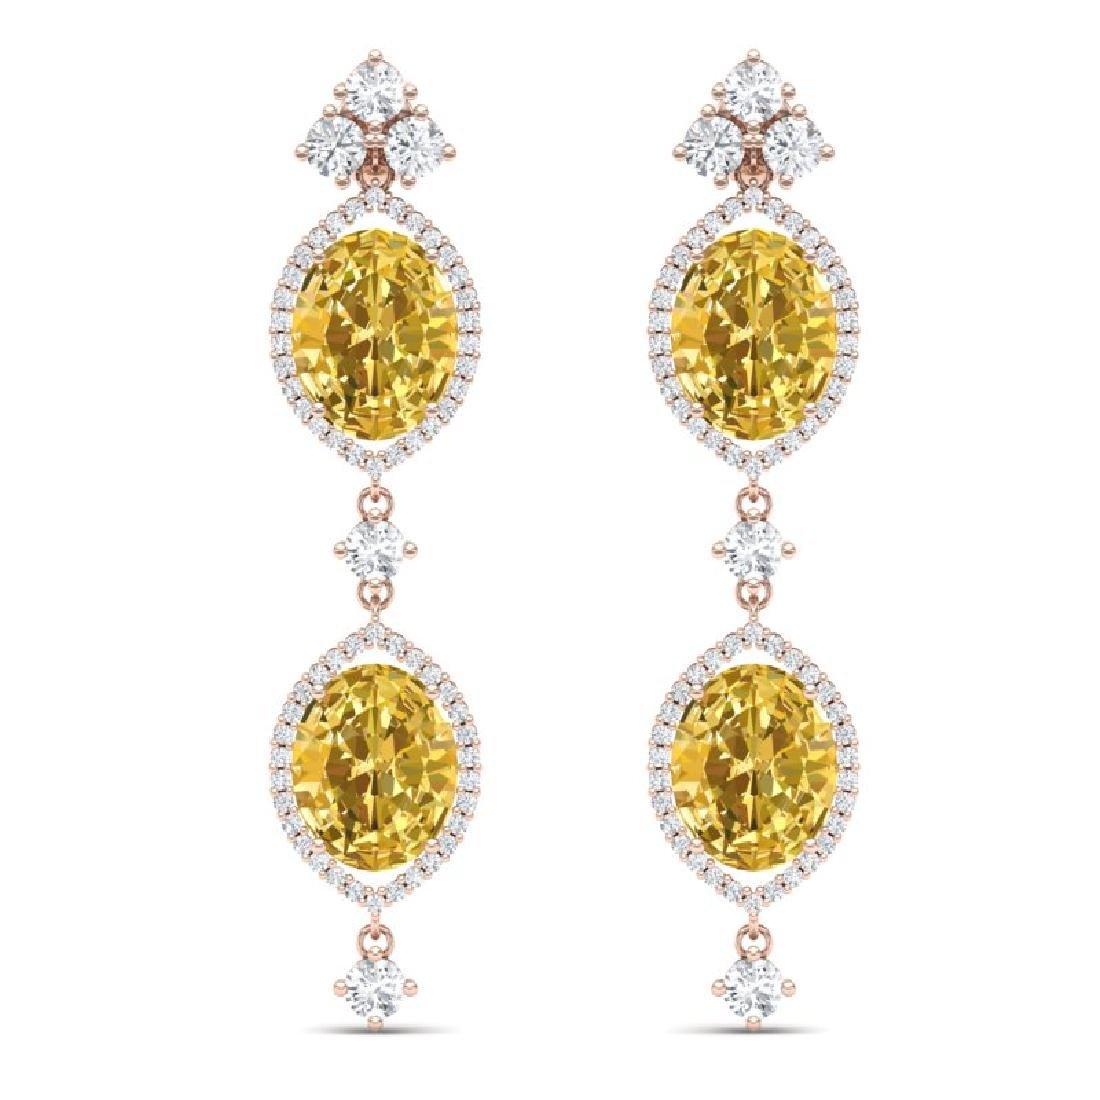 12.21 CTW Royalty Canary Citrine & VS Diamond Earrings